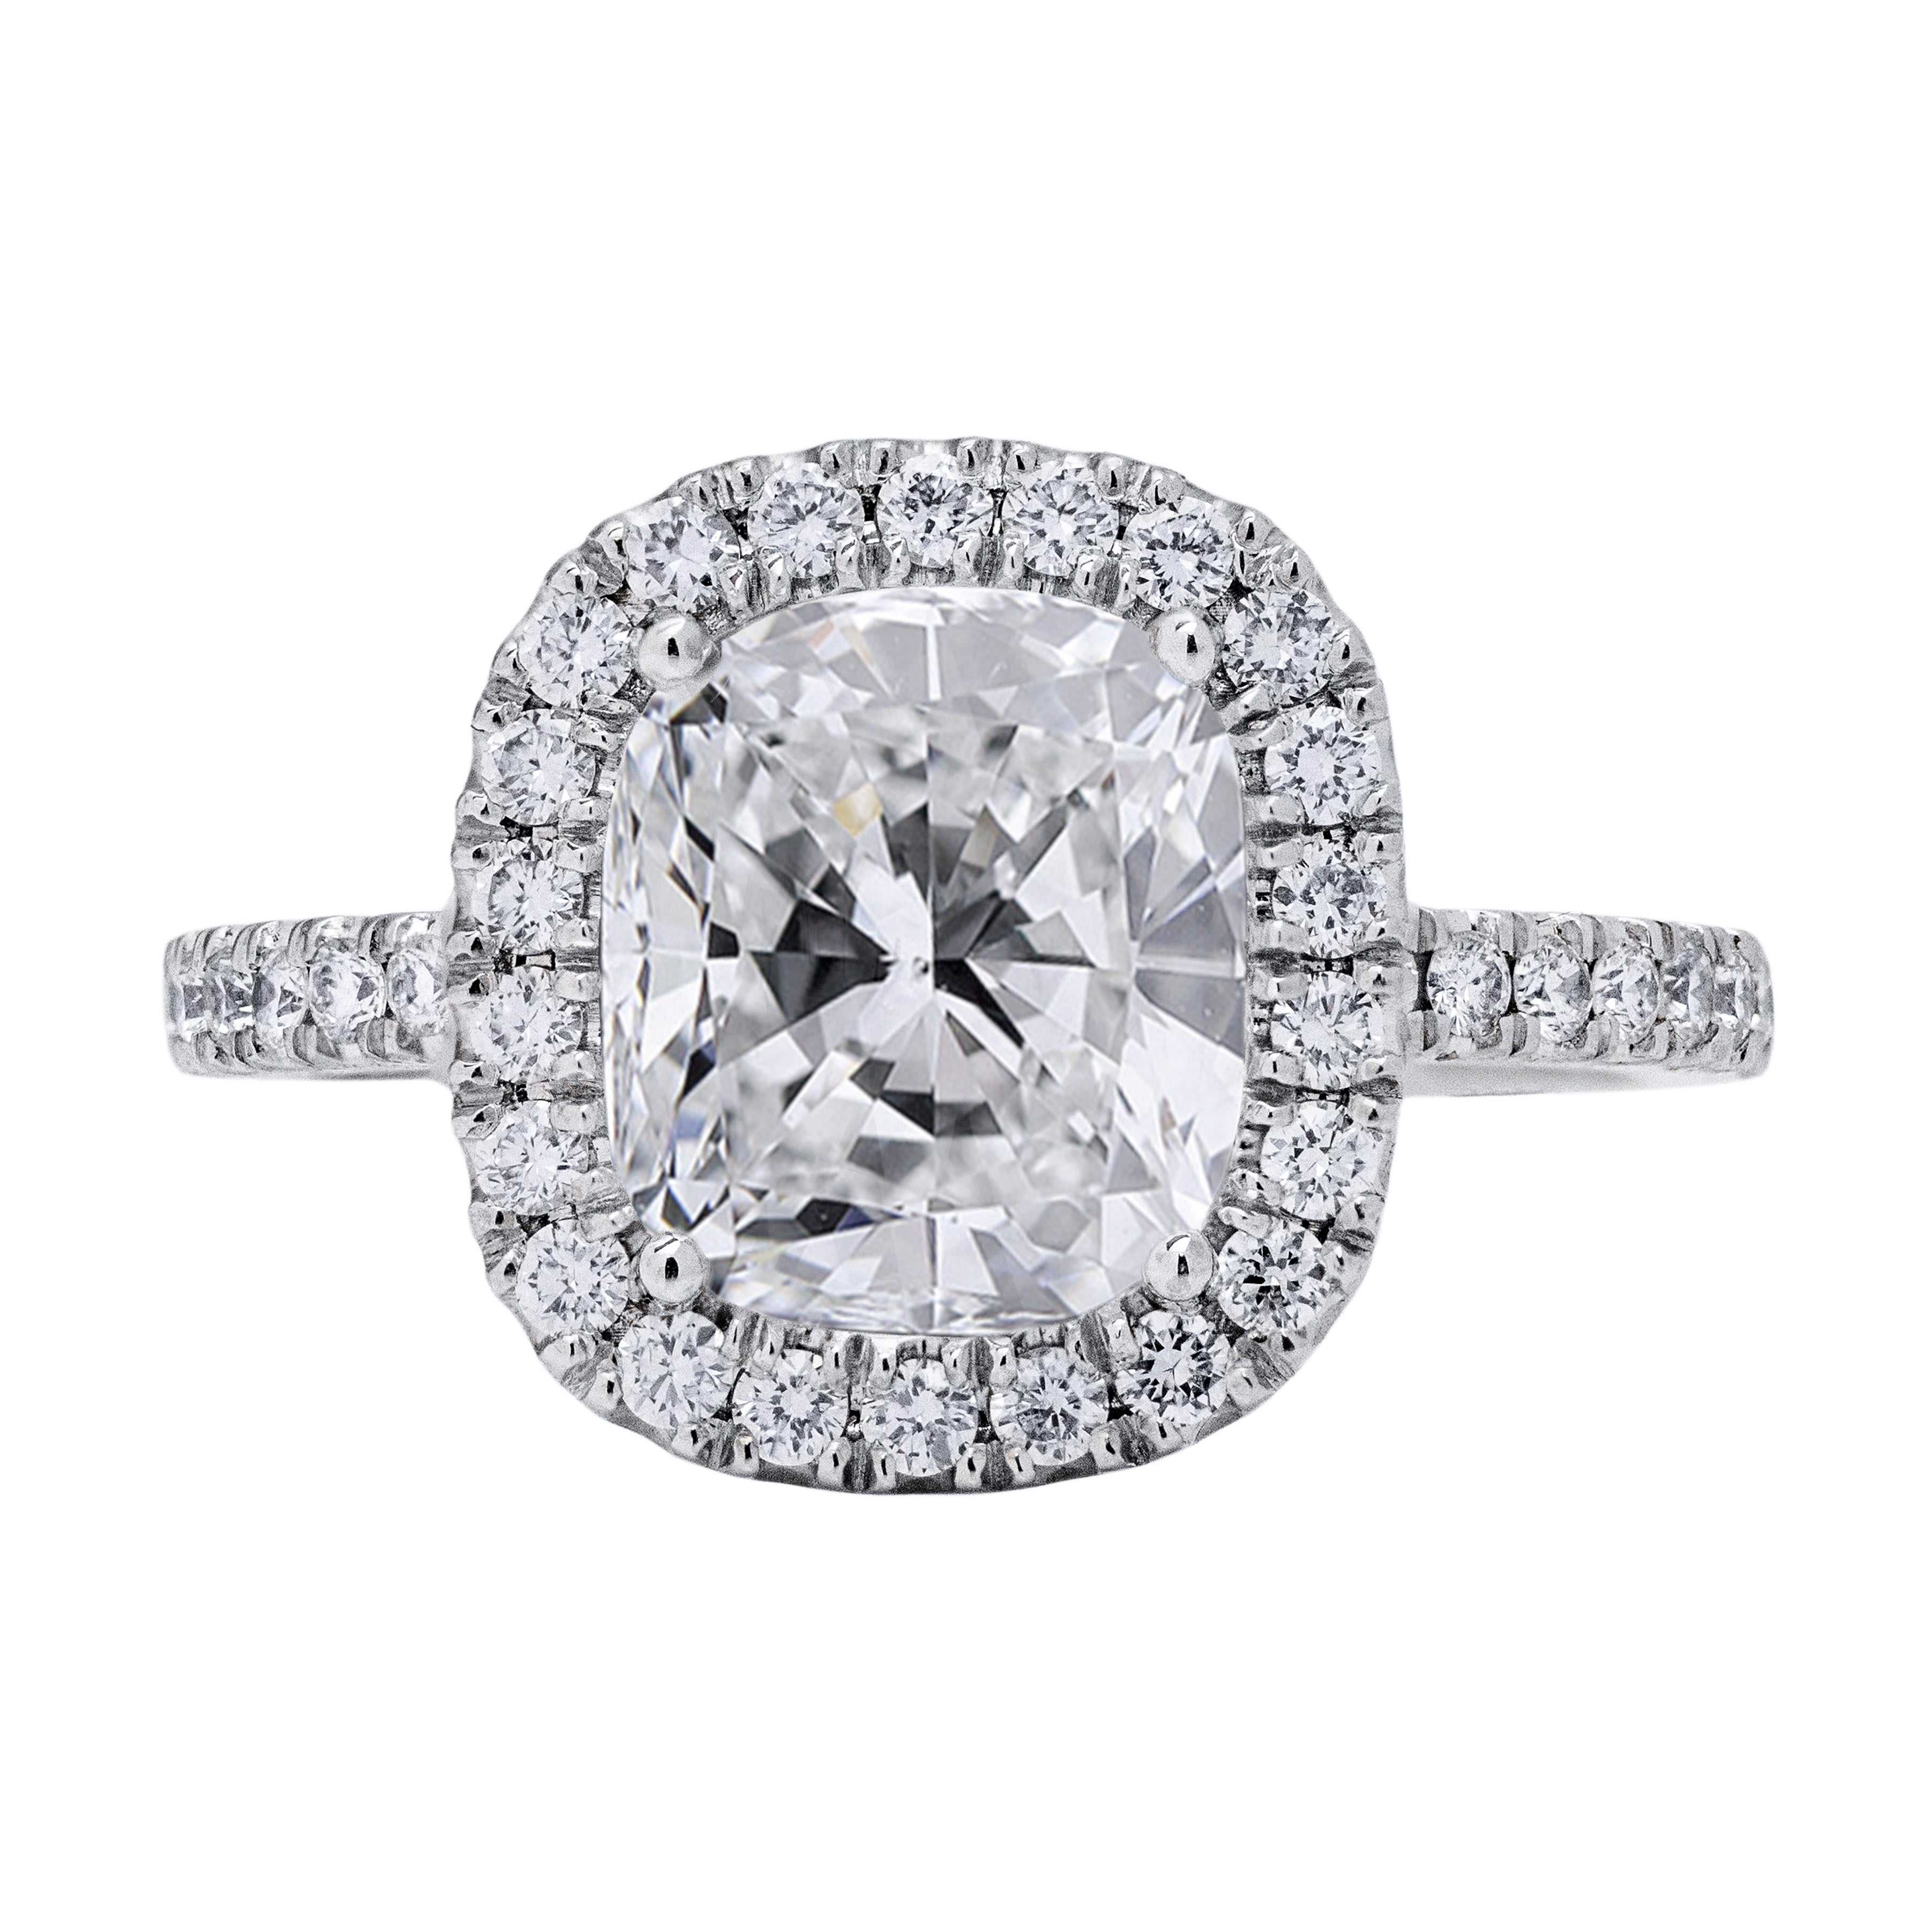 Roman Malakov, GIA Certified Cushion Cut Diamond Halo Engagement Ring